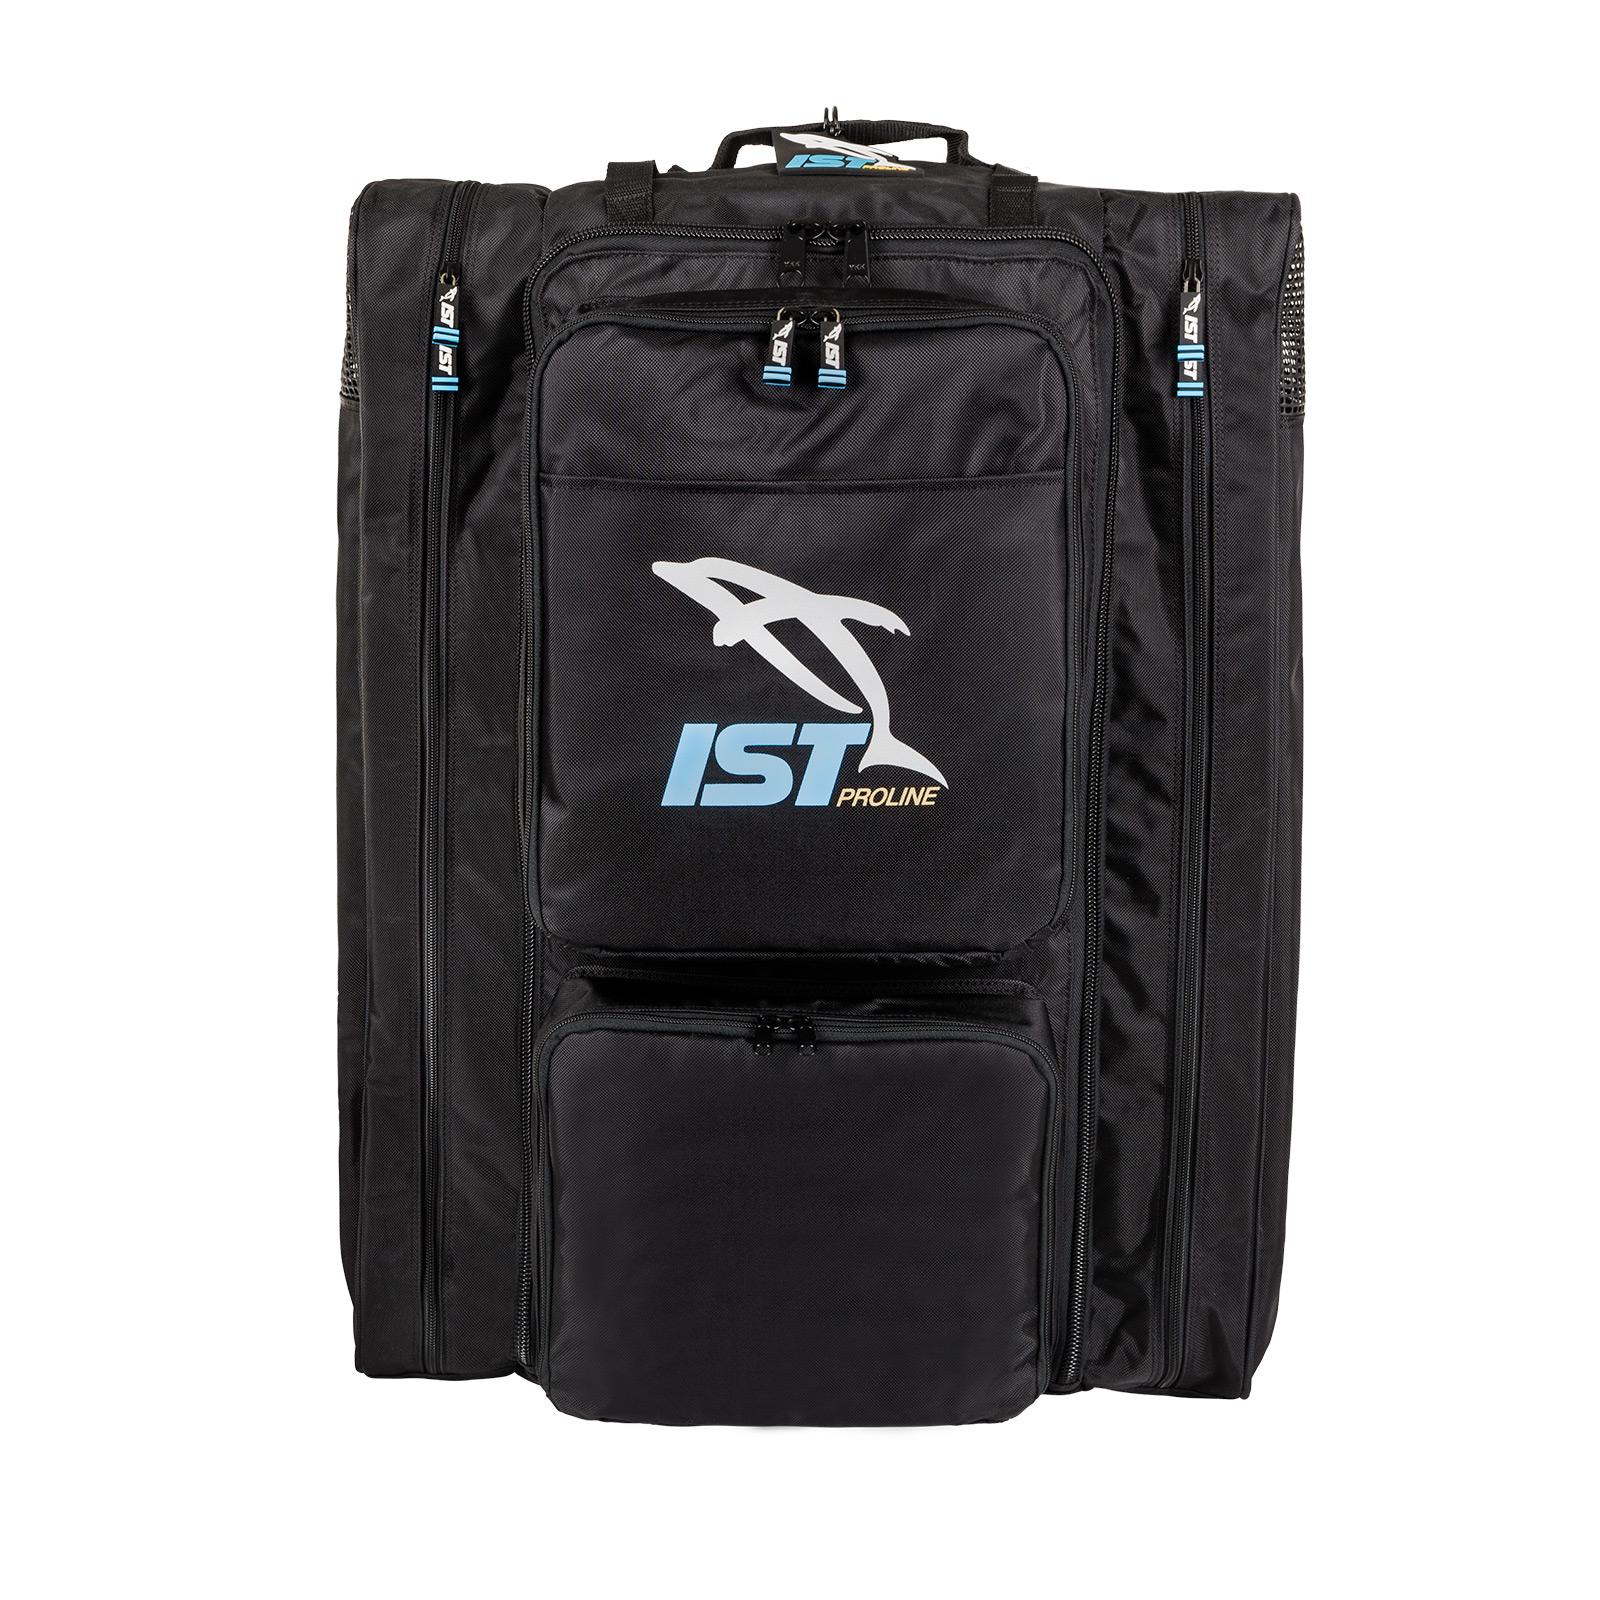 Heavy Duty Backpack Bag